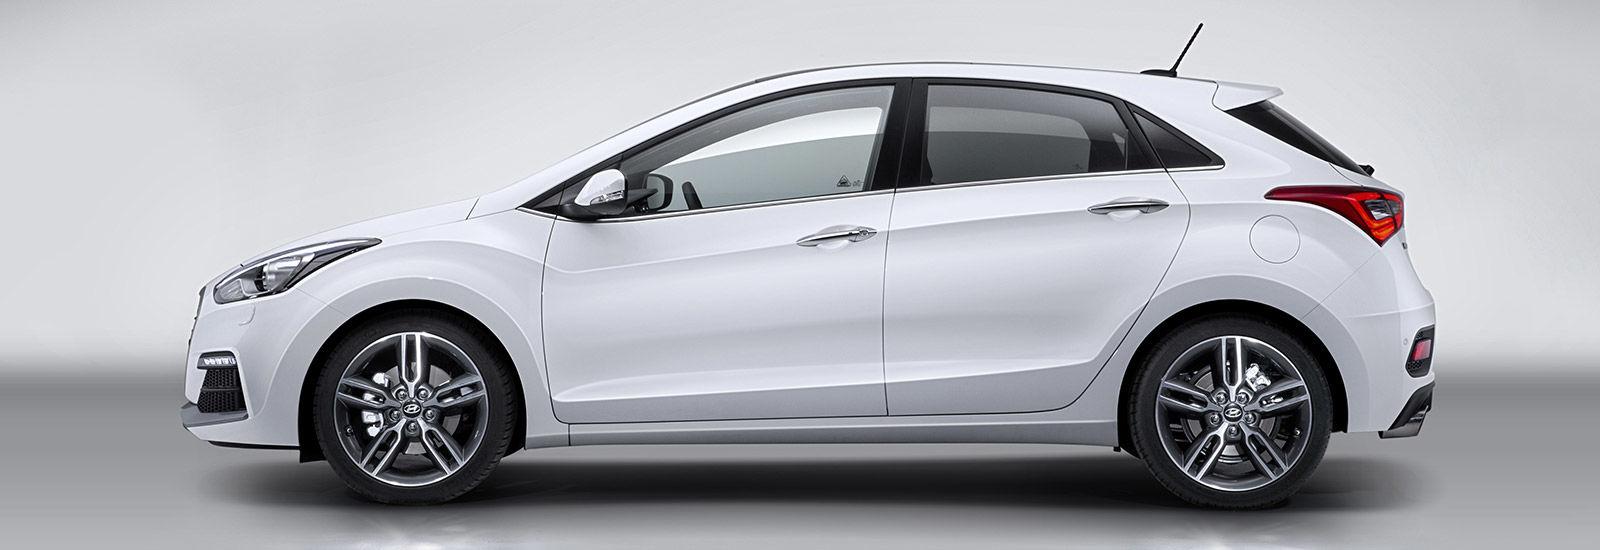 Hyundai i30  Tourer sizes  dimensions guide  carwow